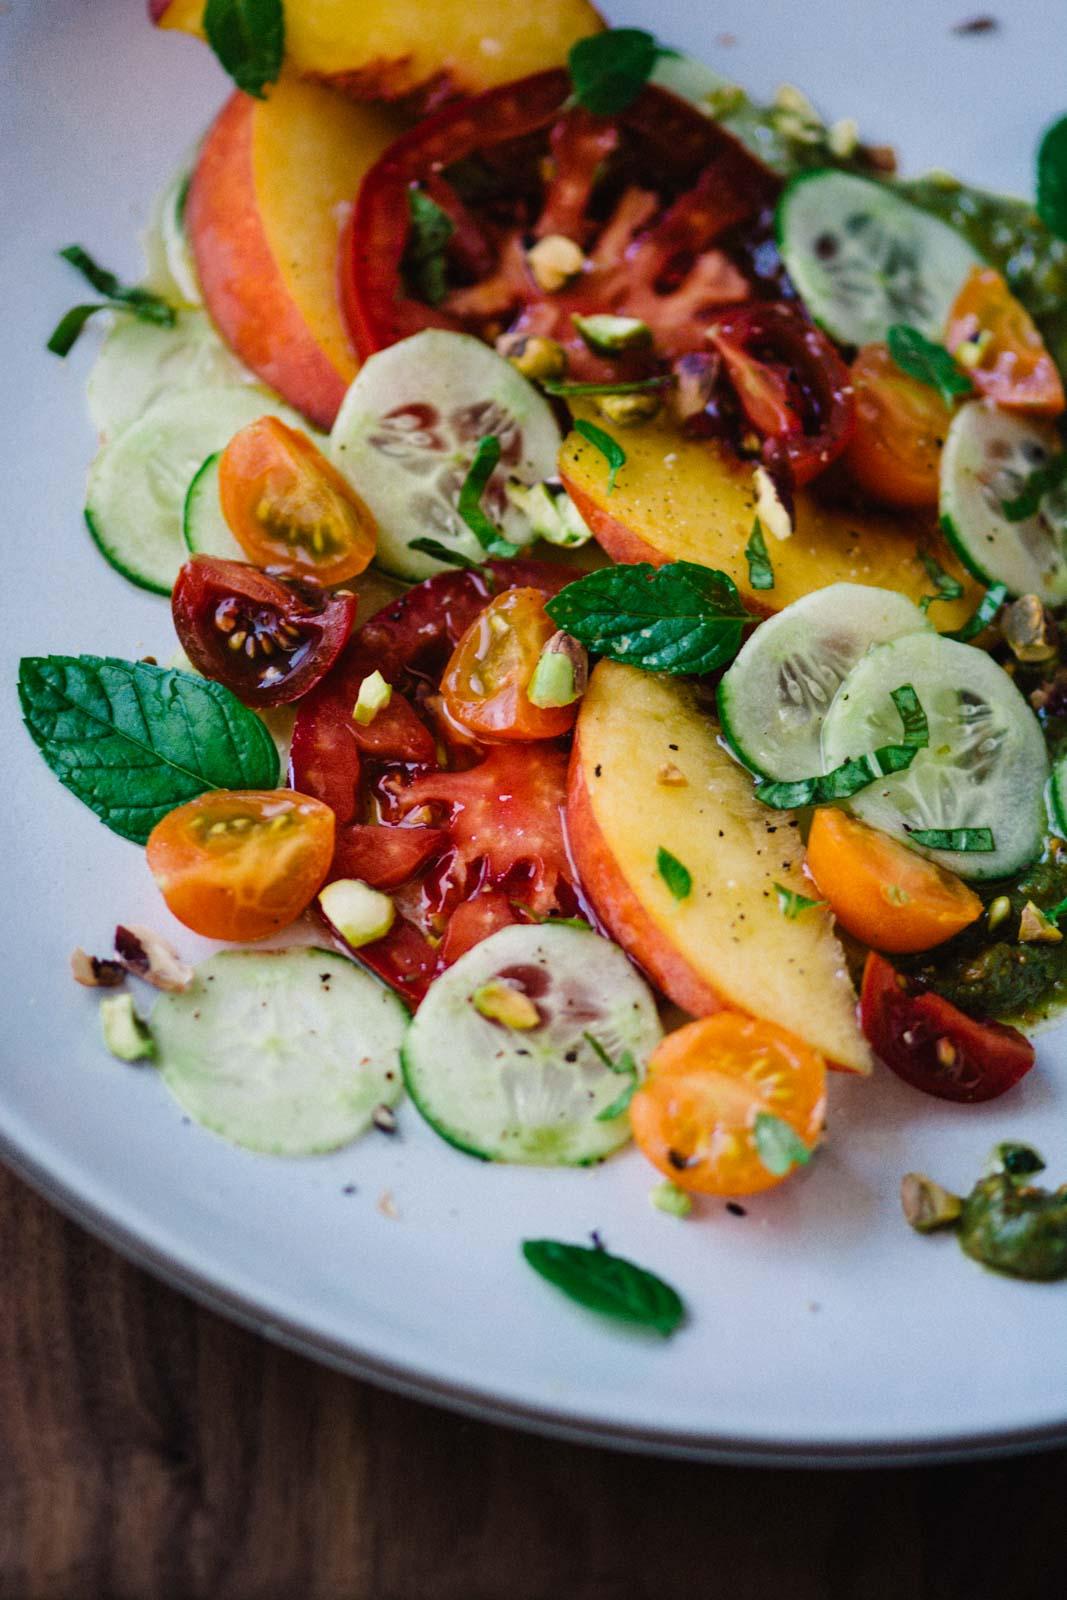 Heirloom tomato, peach and cucumber salad | www.scalingbackblog.com